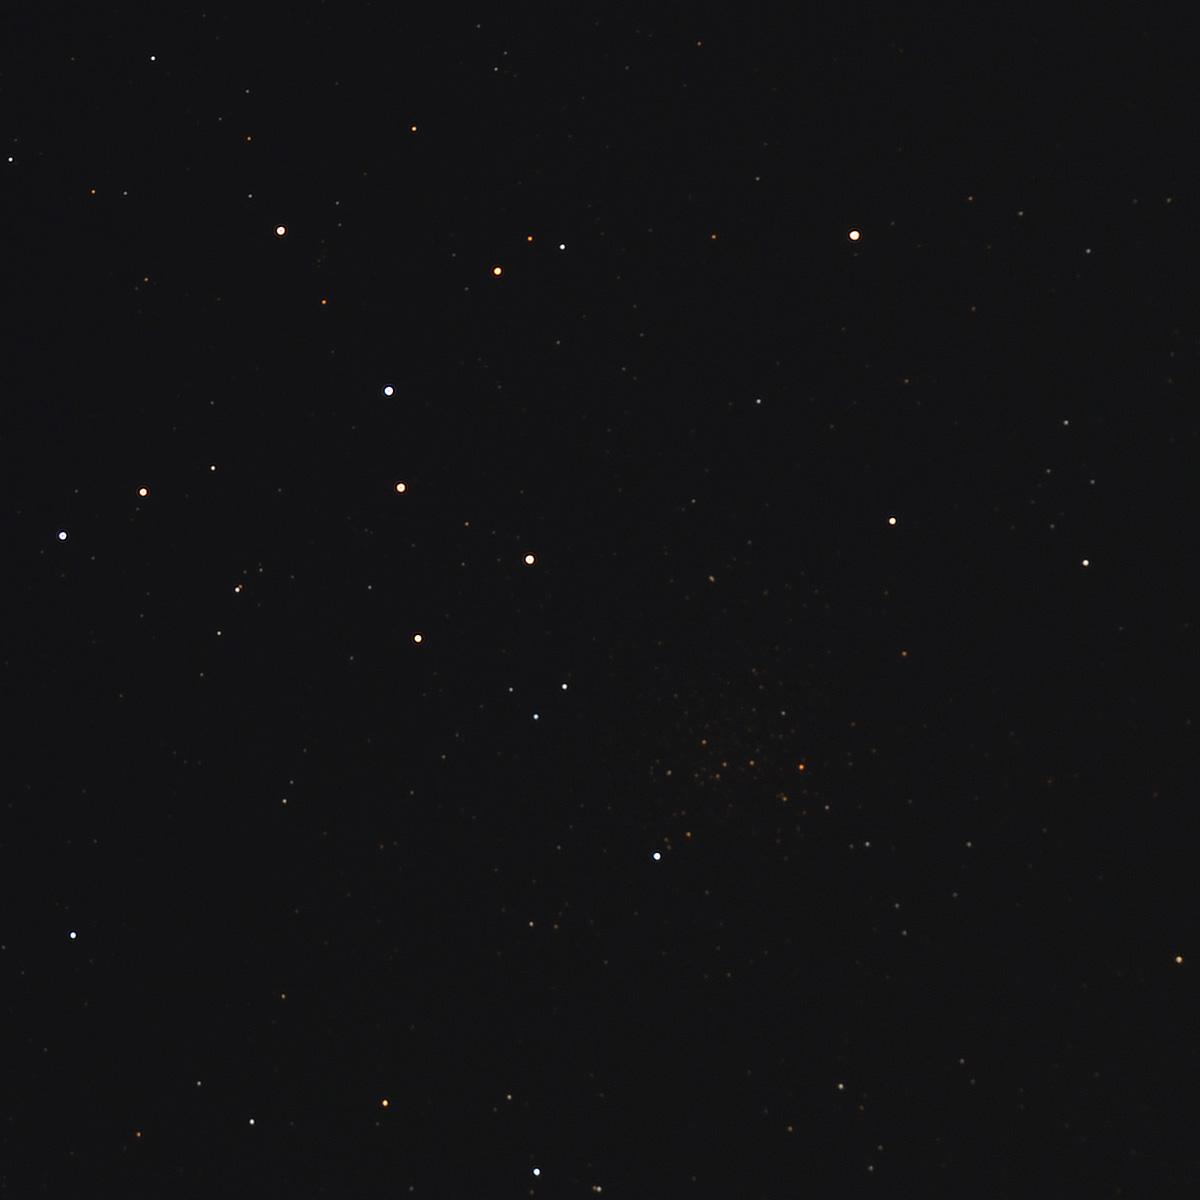 Ngc2158_ln6e_6x2min